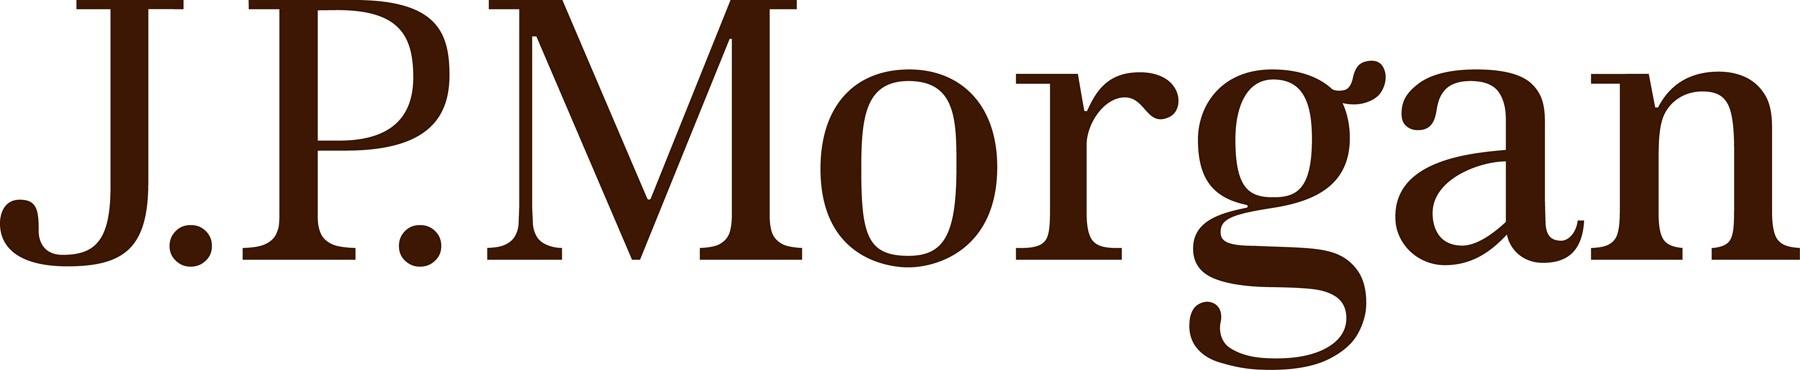 Morgan1.jpeg